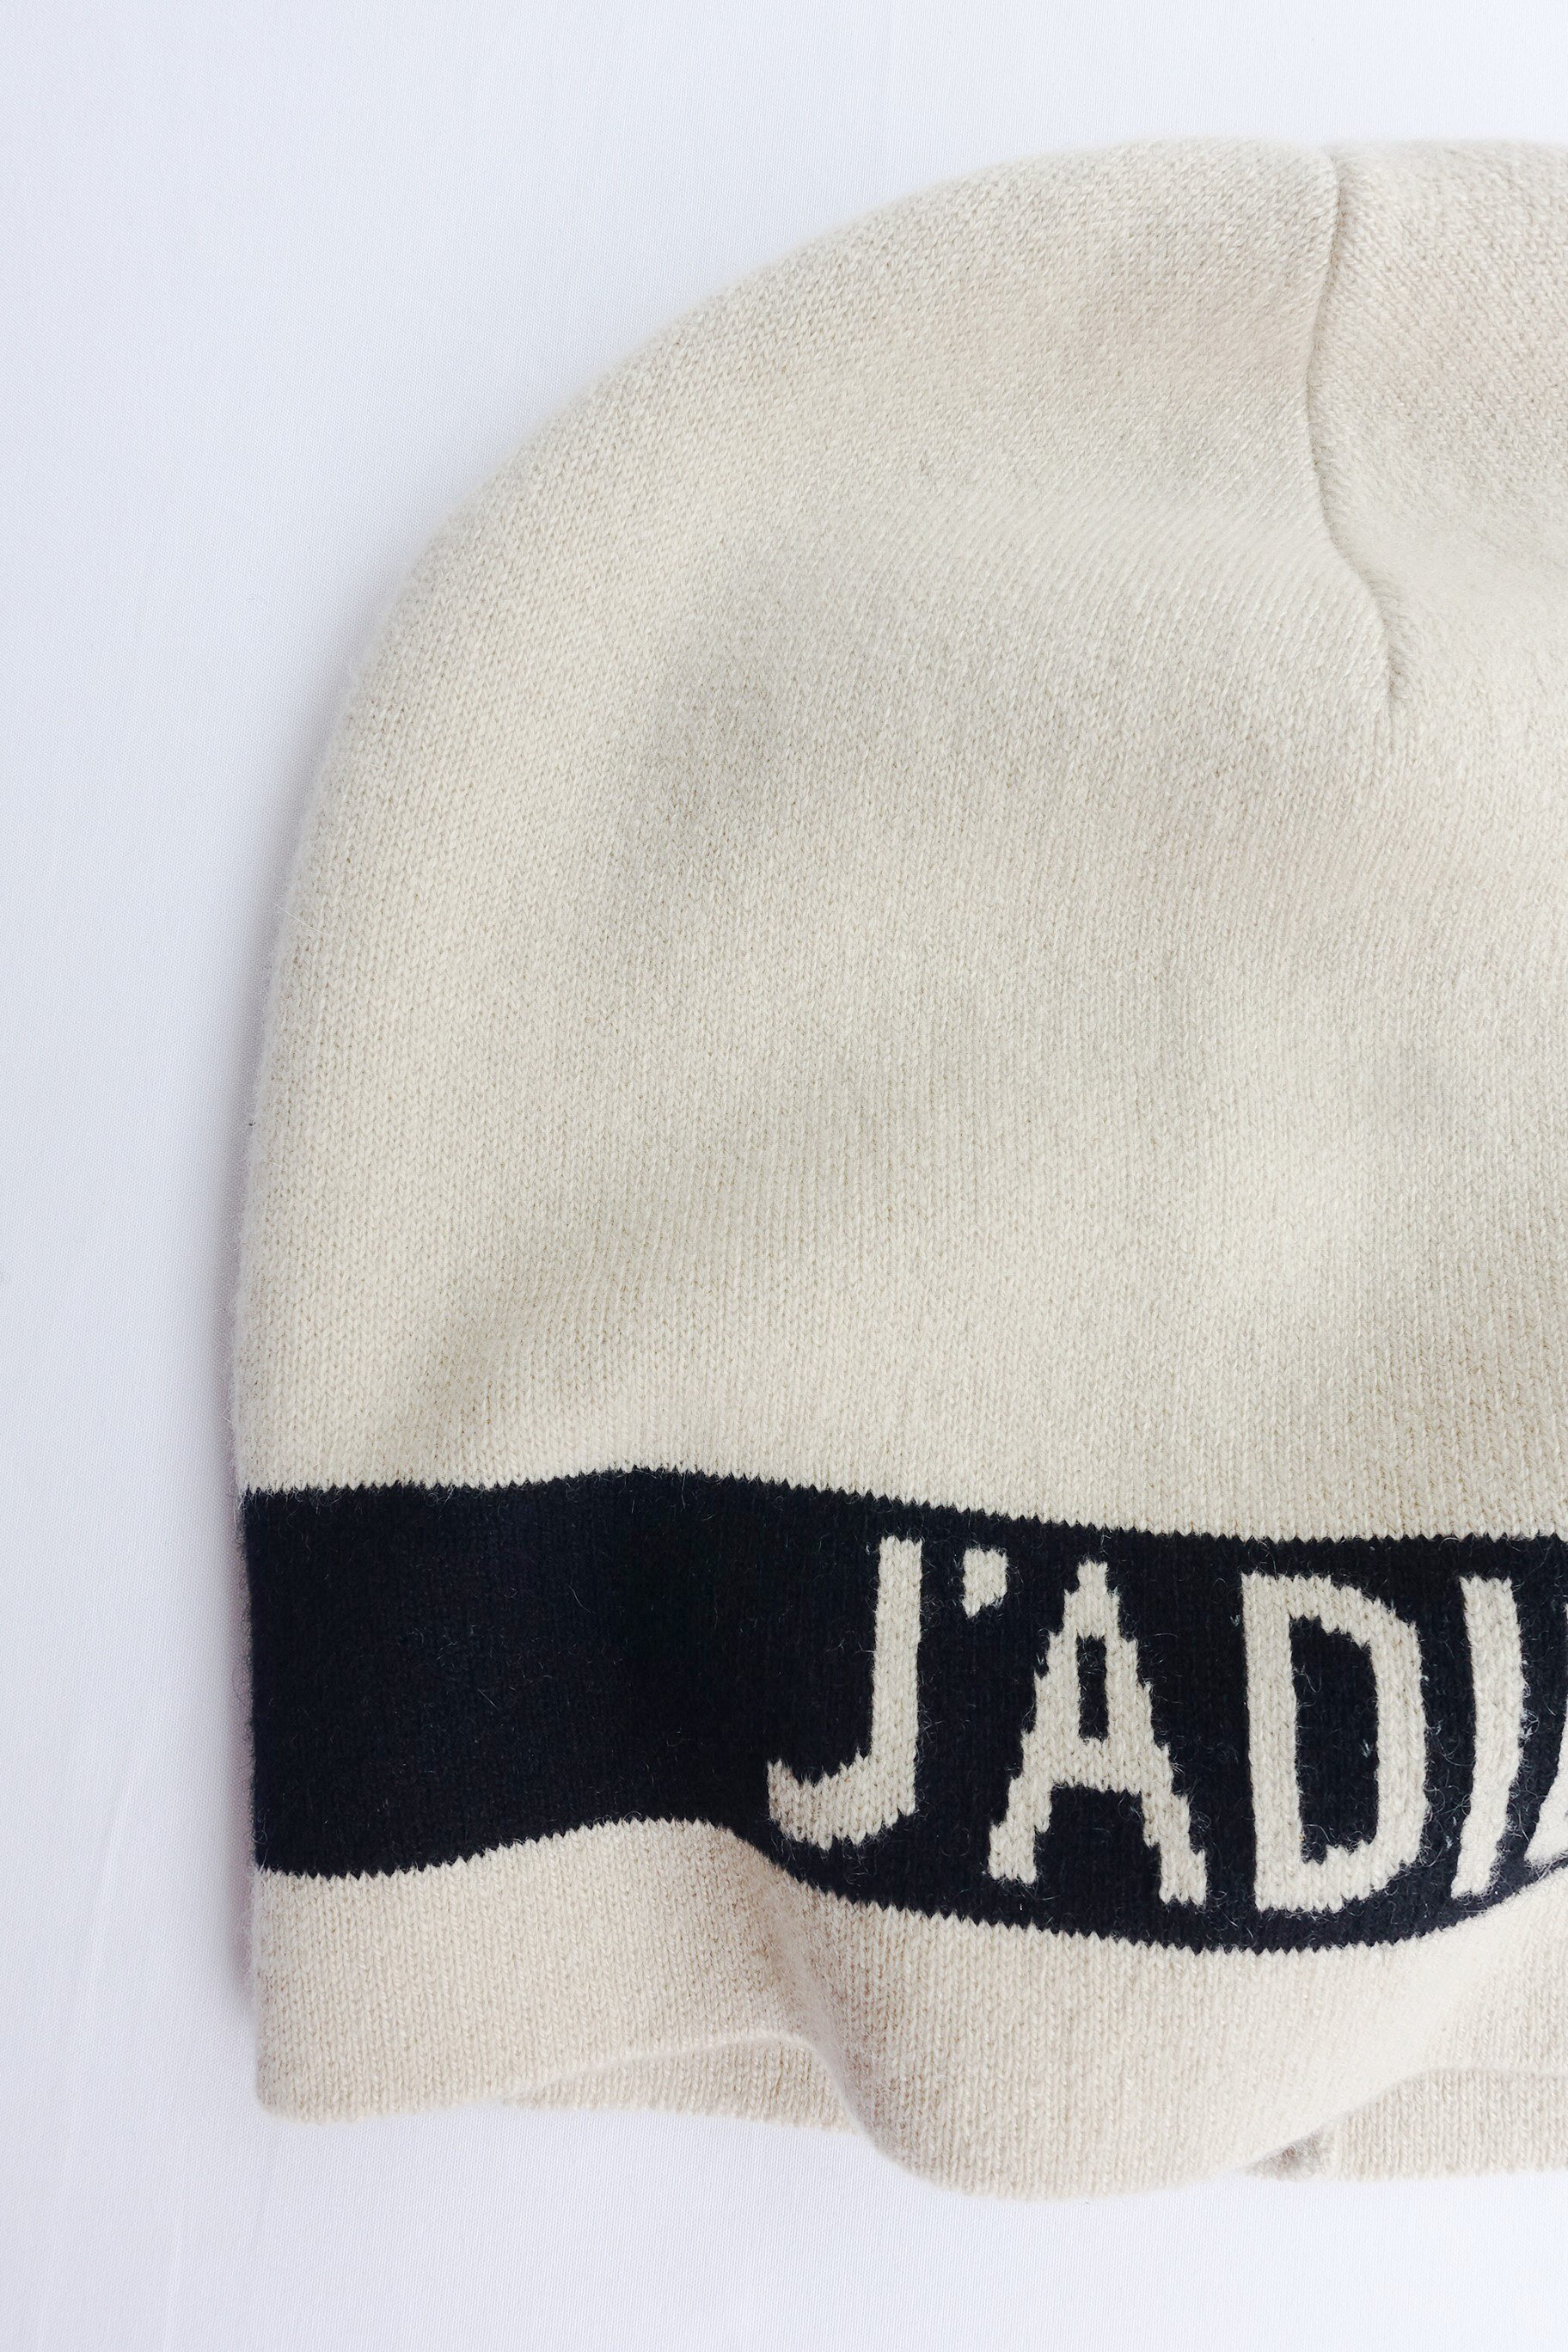 (Smile) J'A DIOR 經典羊絨毛帽 黑色 白色 雙色可選